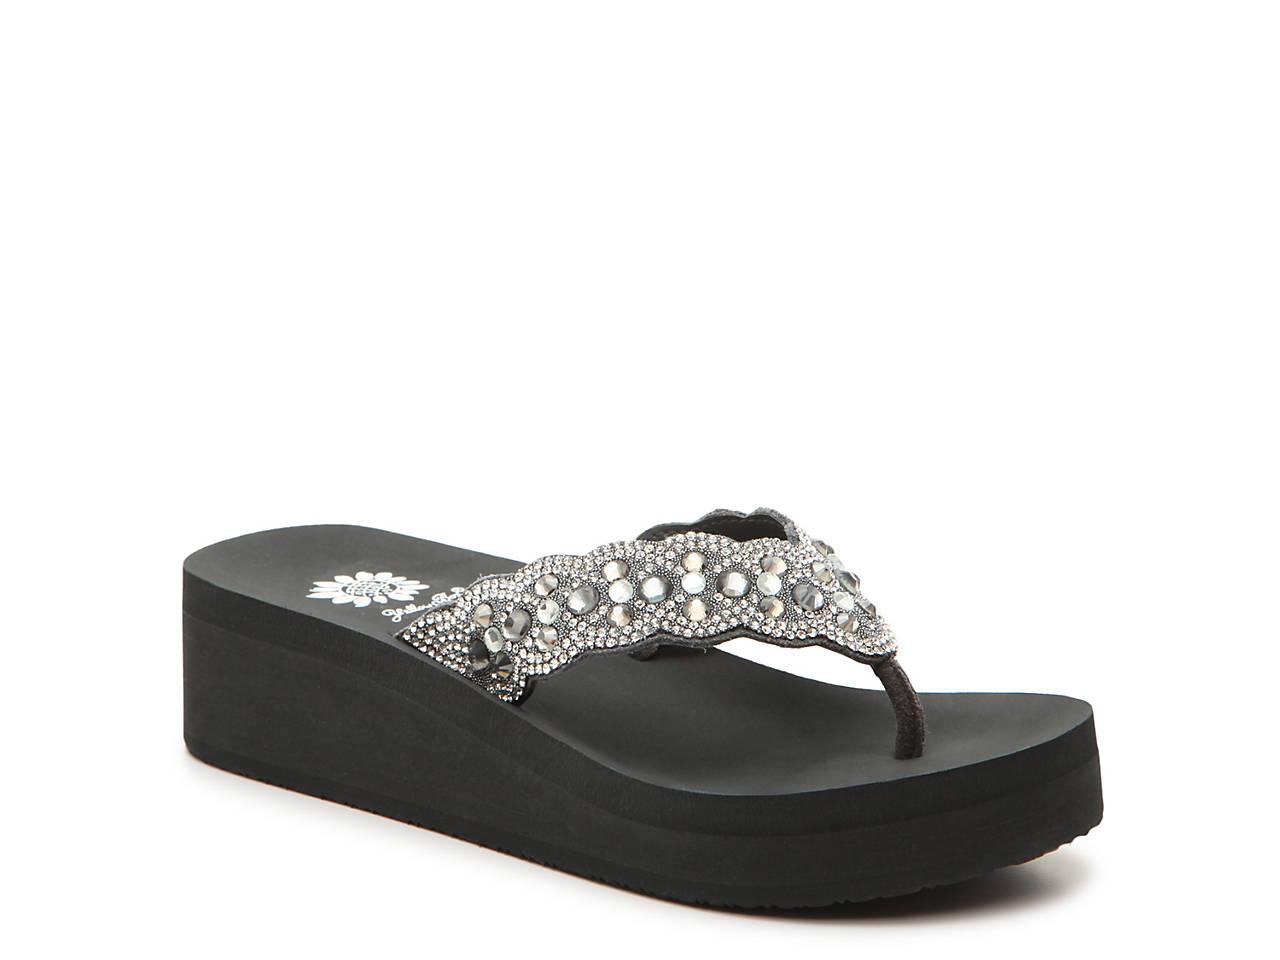 b38798a1b1c5 Yellow Box Rubie Wedge Flip Flop Women s Shoes